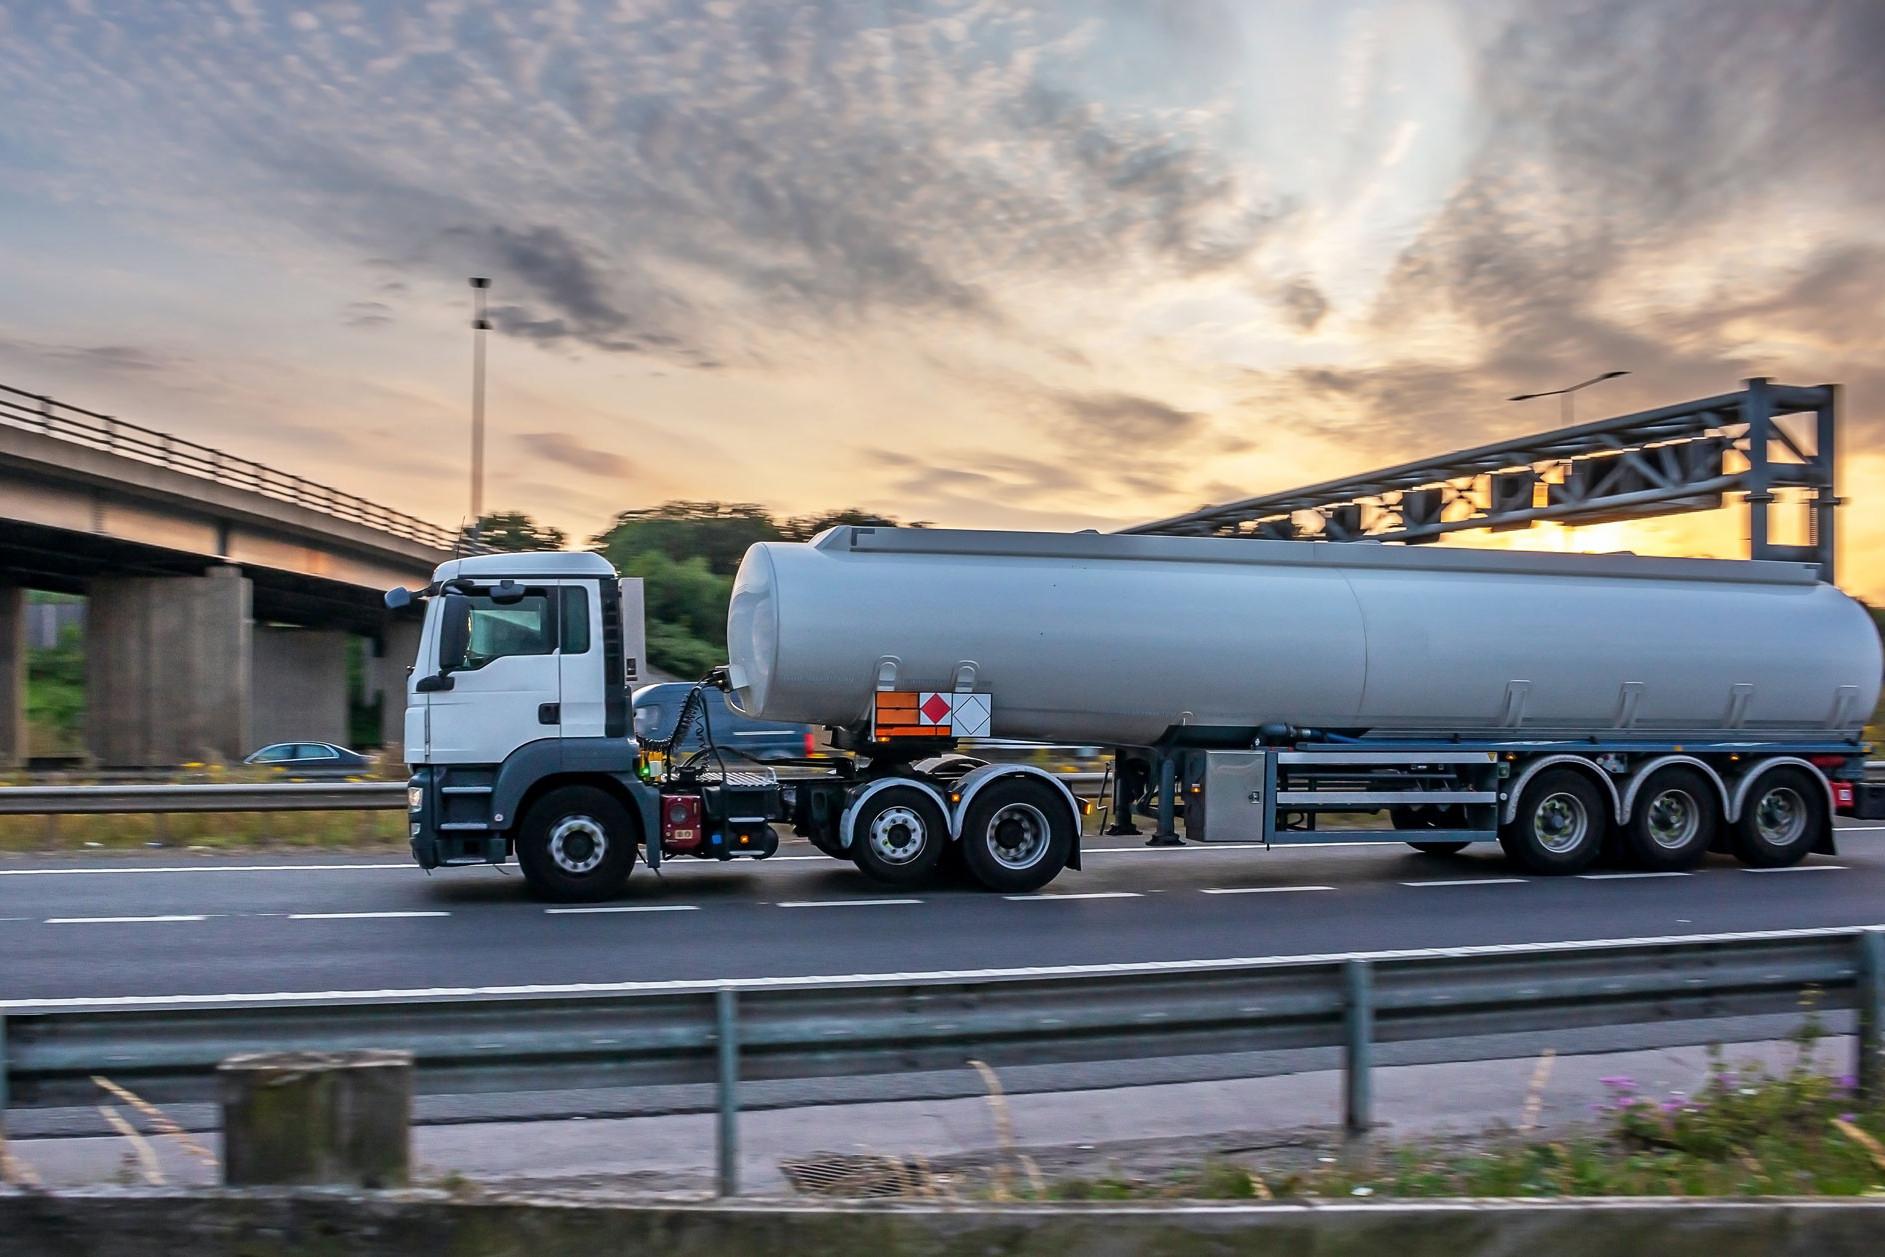 ADR lorry driver